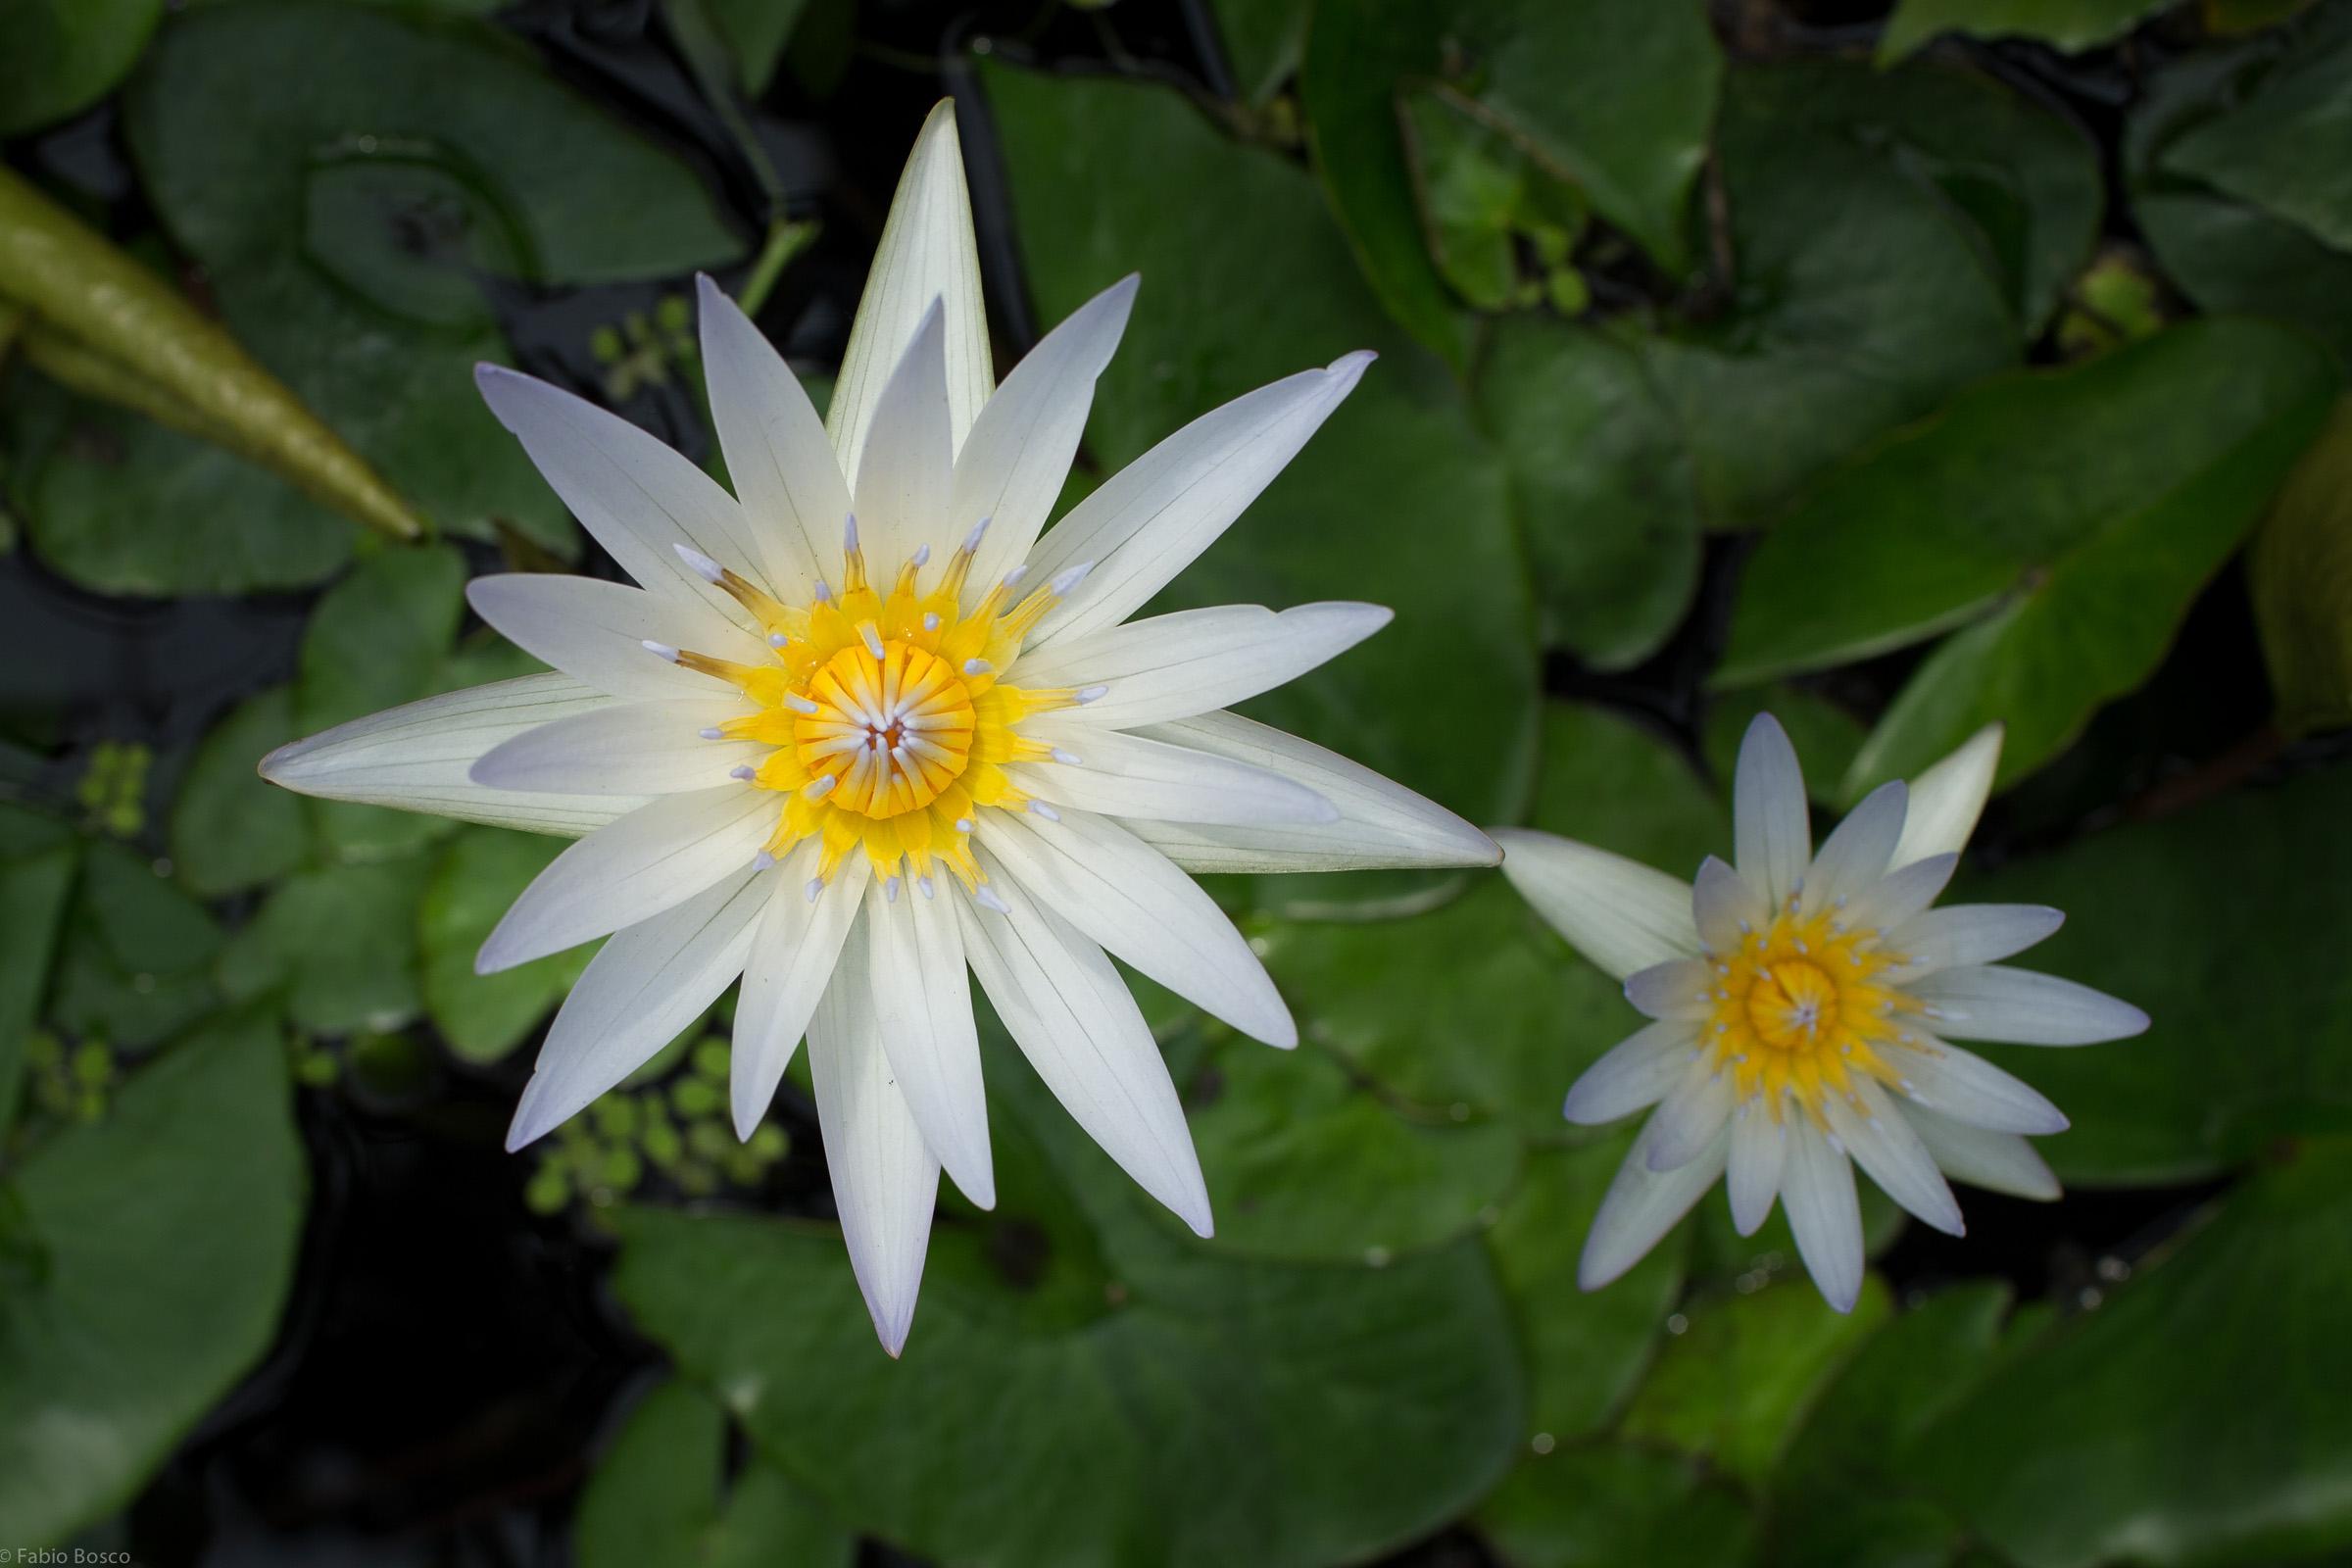 FabioBoscoPhotography_Spring is here-106627.jpg